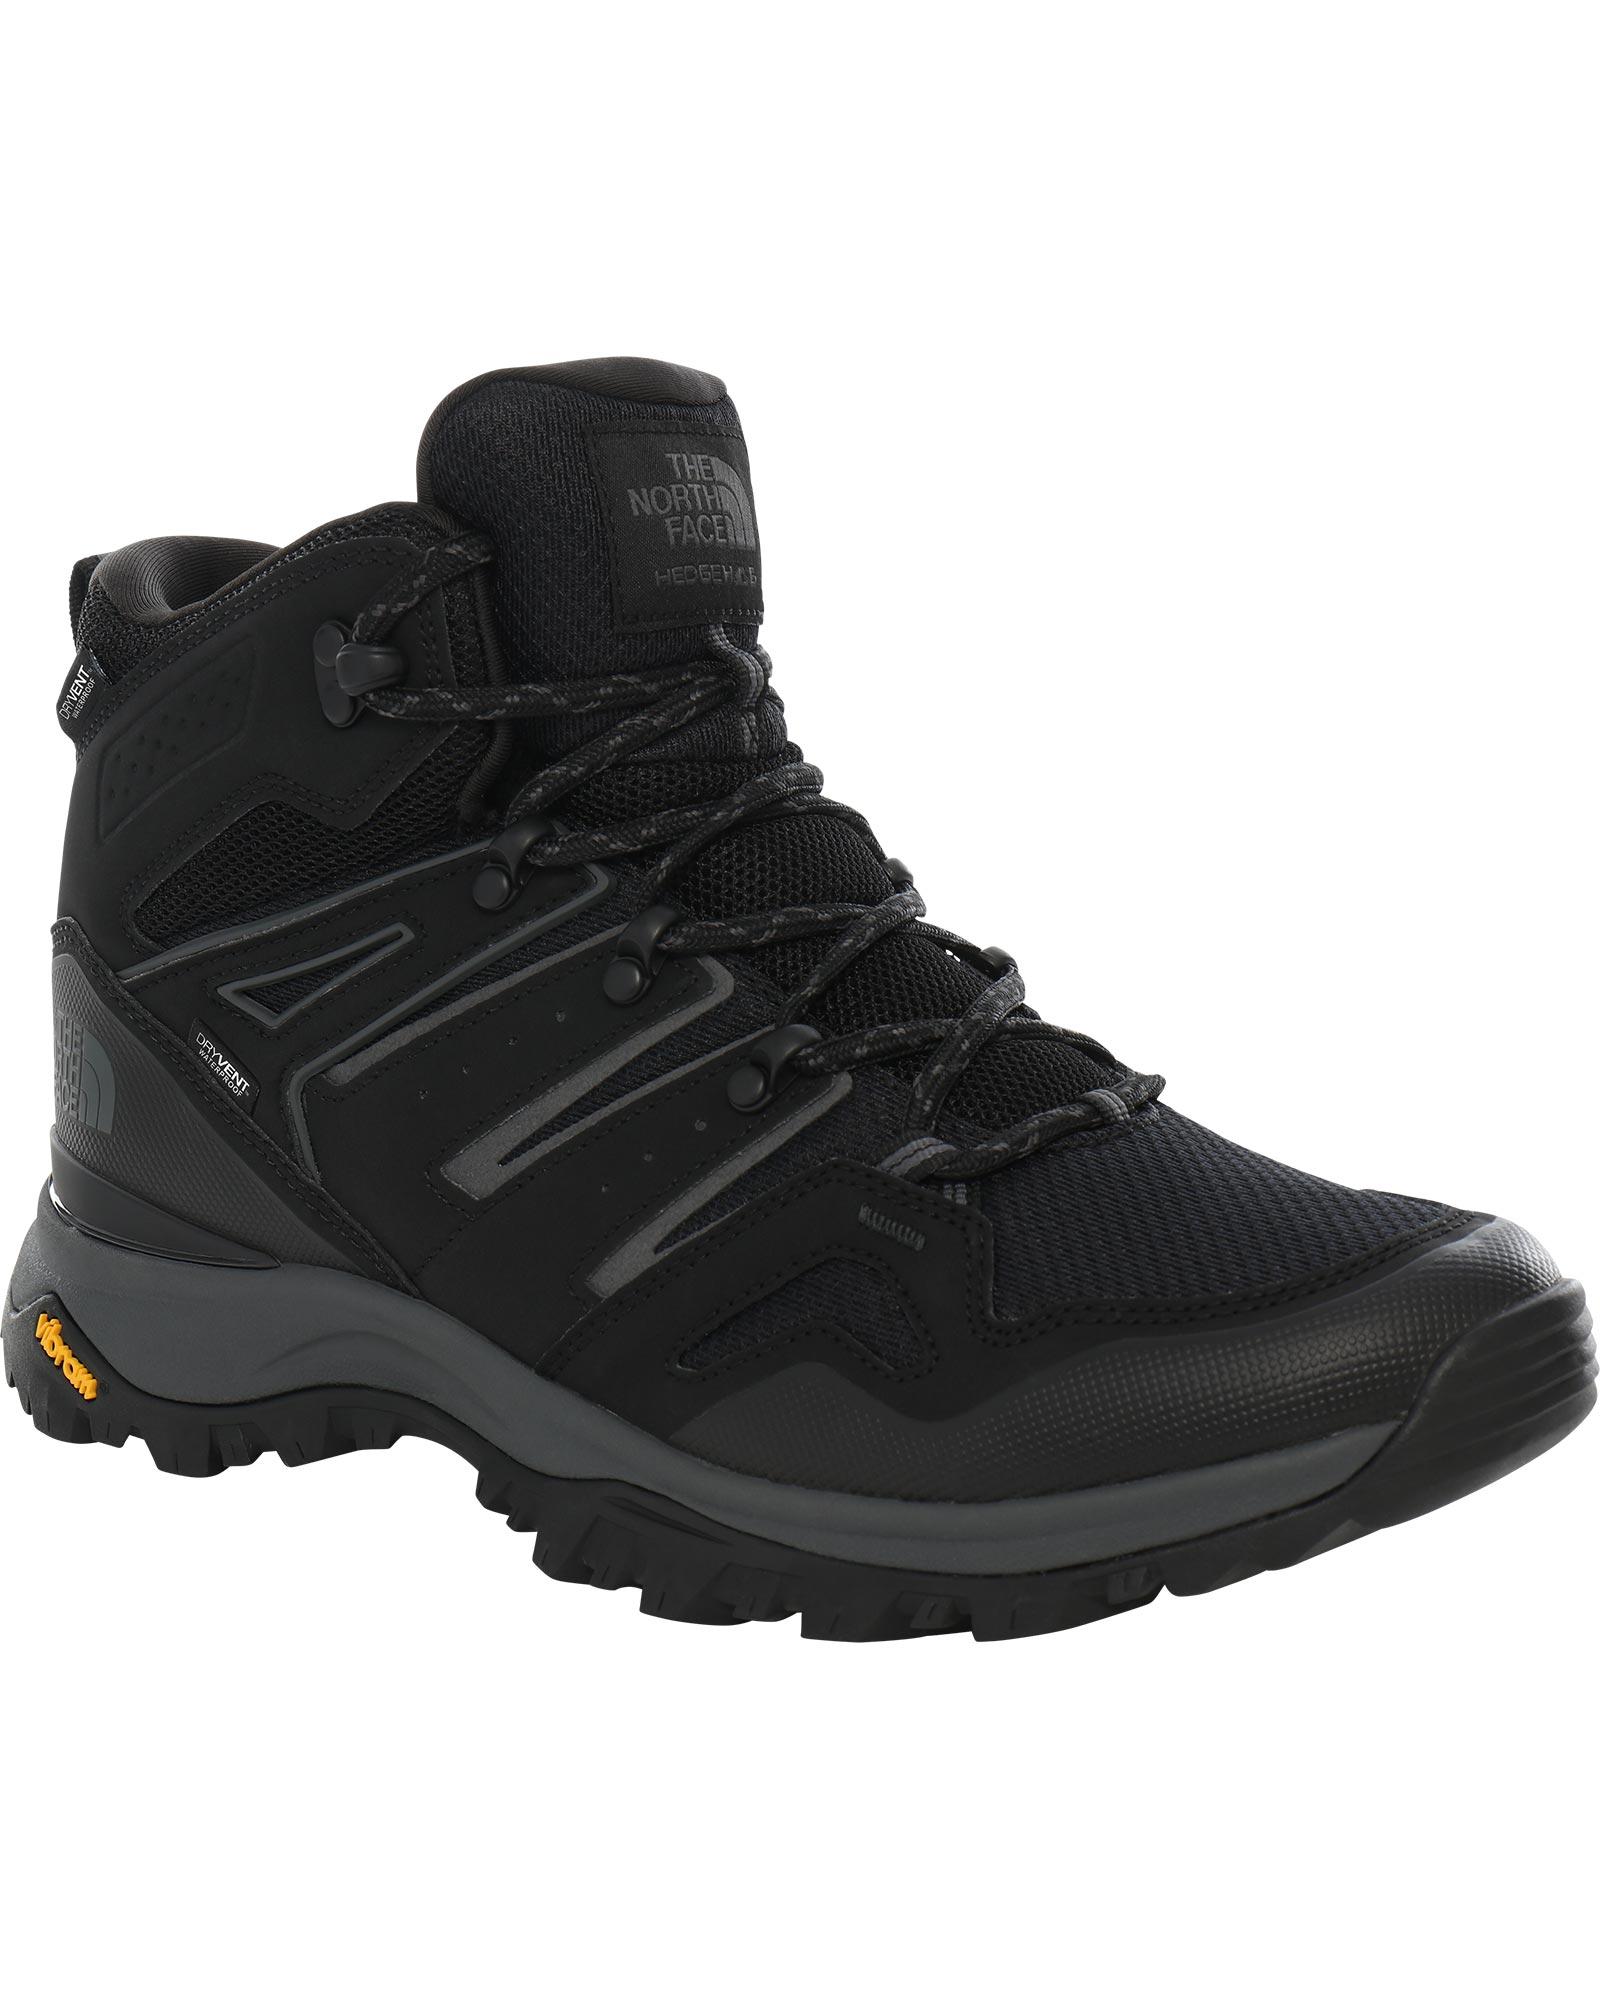 The North Face Men's Hedgehog Fastpack II Mid Waterproof Walking Boots 0